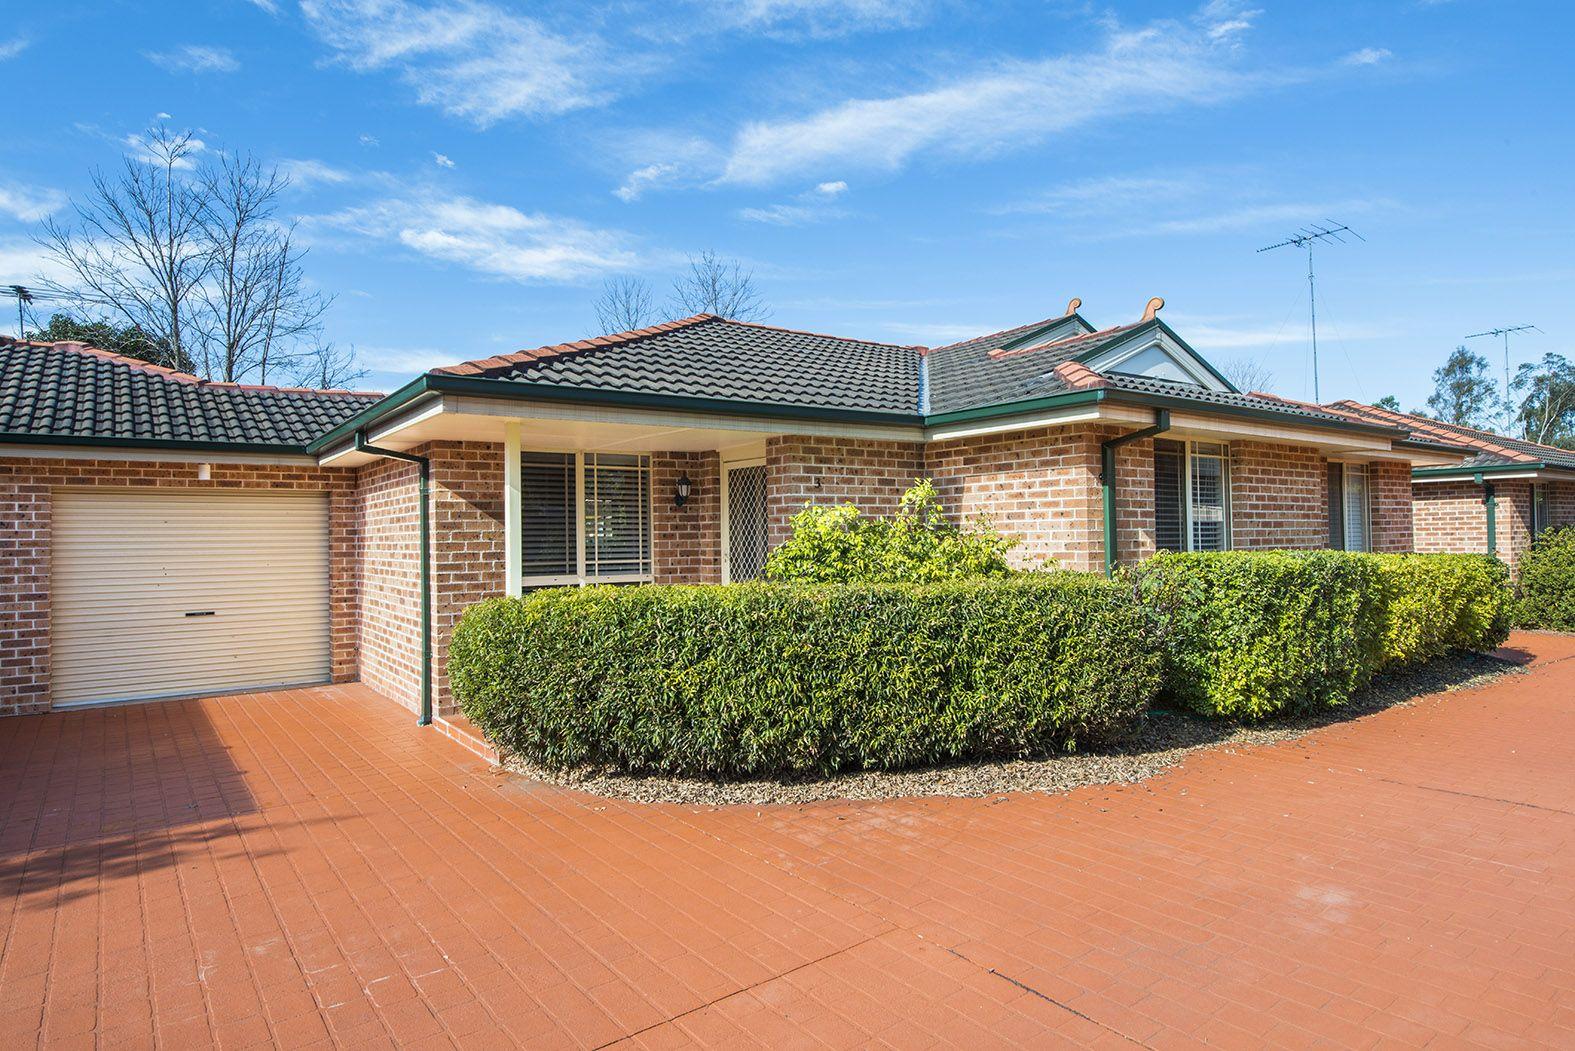 3/106 Forbes Street, Emu Plains NSW 2750, Image 0